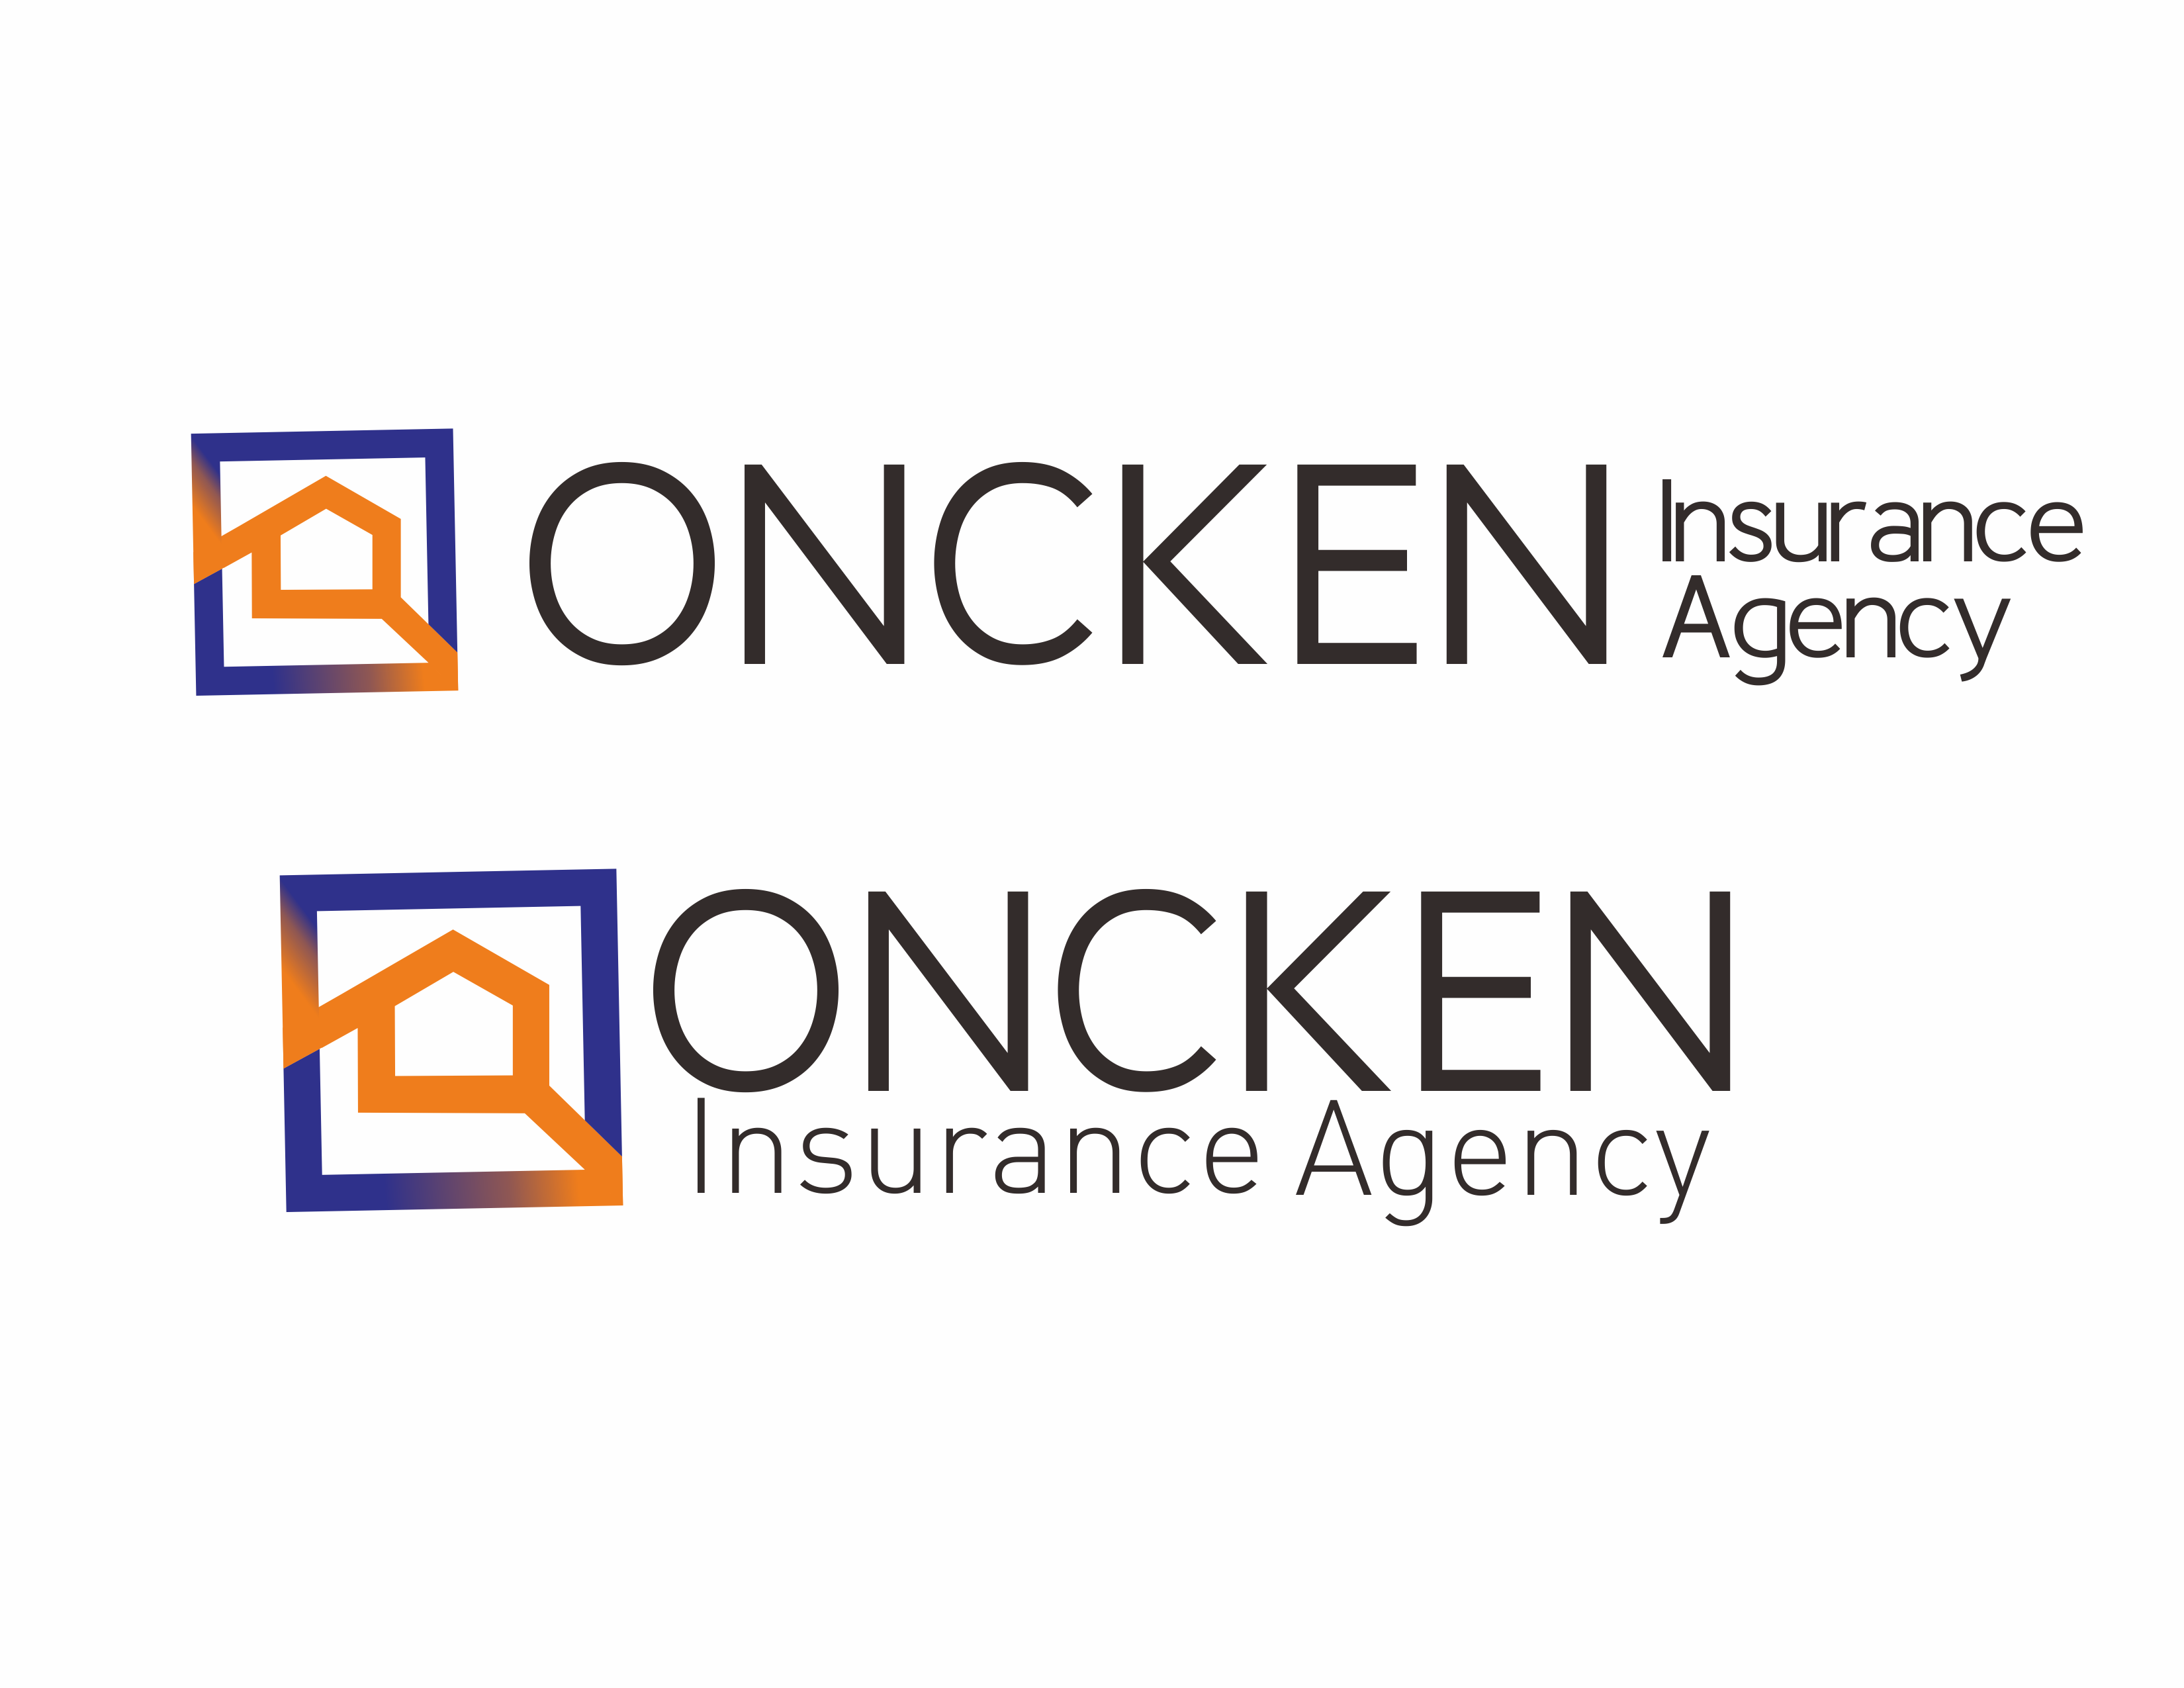 Logo Design Contest for Oncken Insurance Agency | Hatchwise